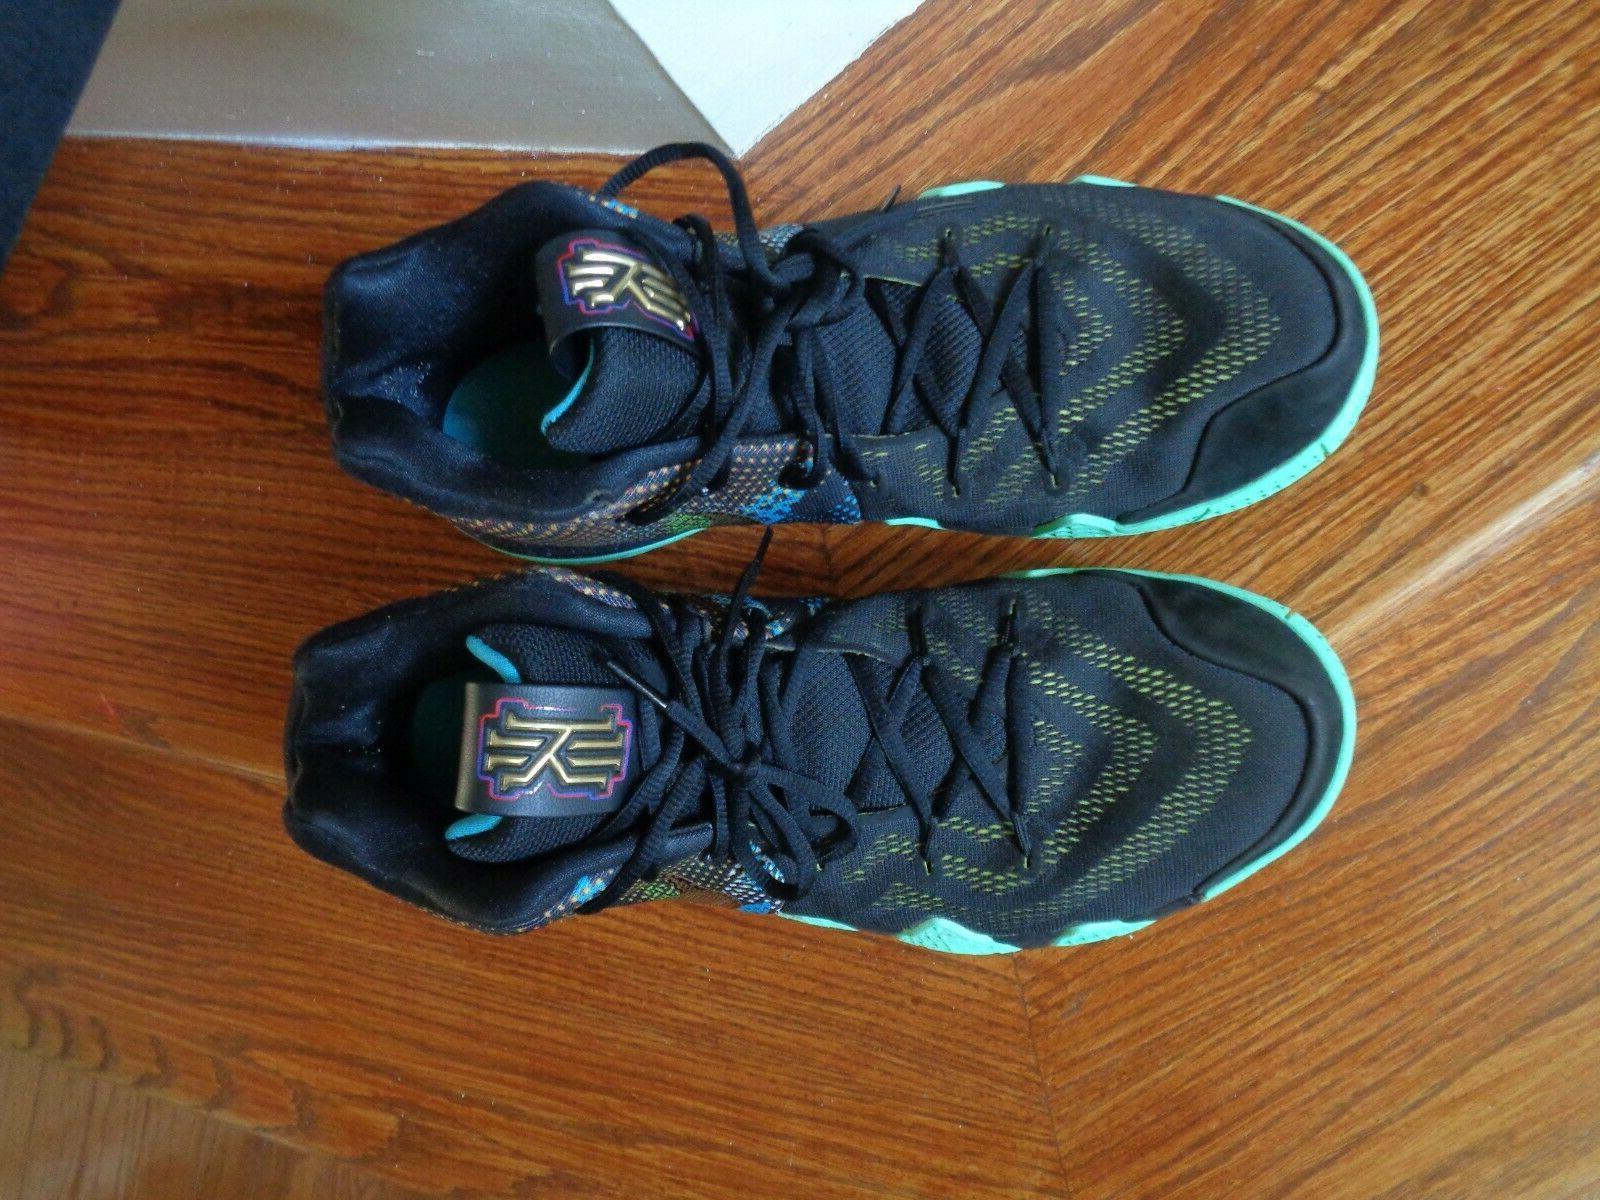 Nike Kyrie Men's Basketball Shoes, 001